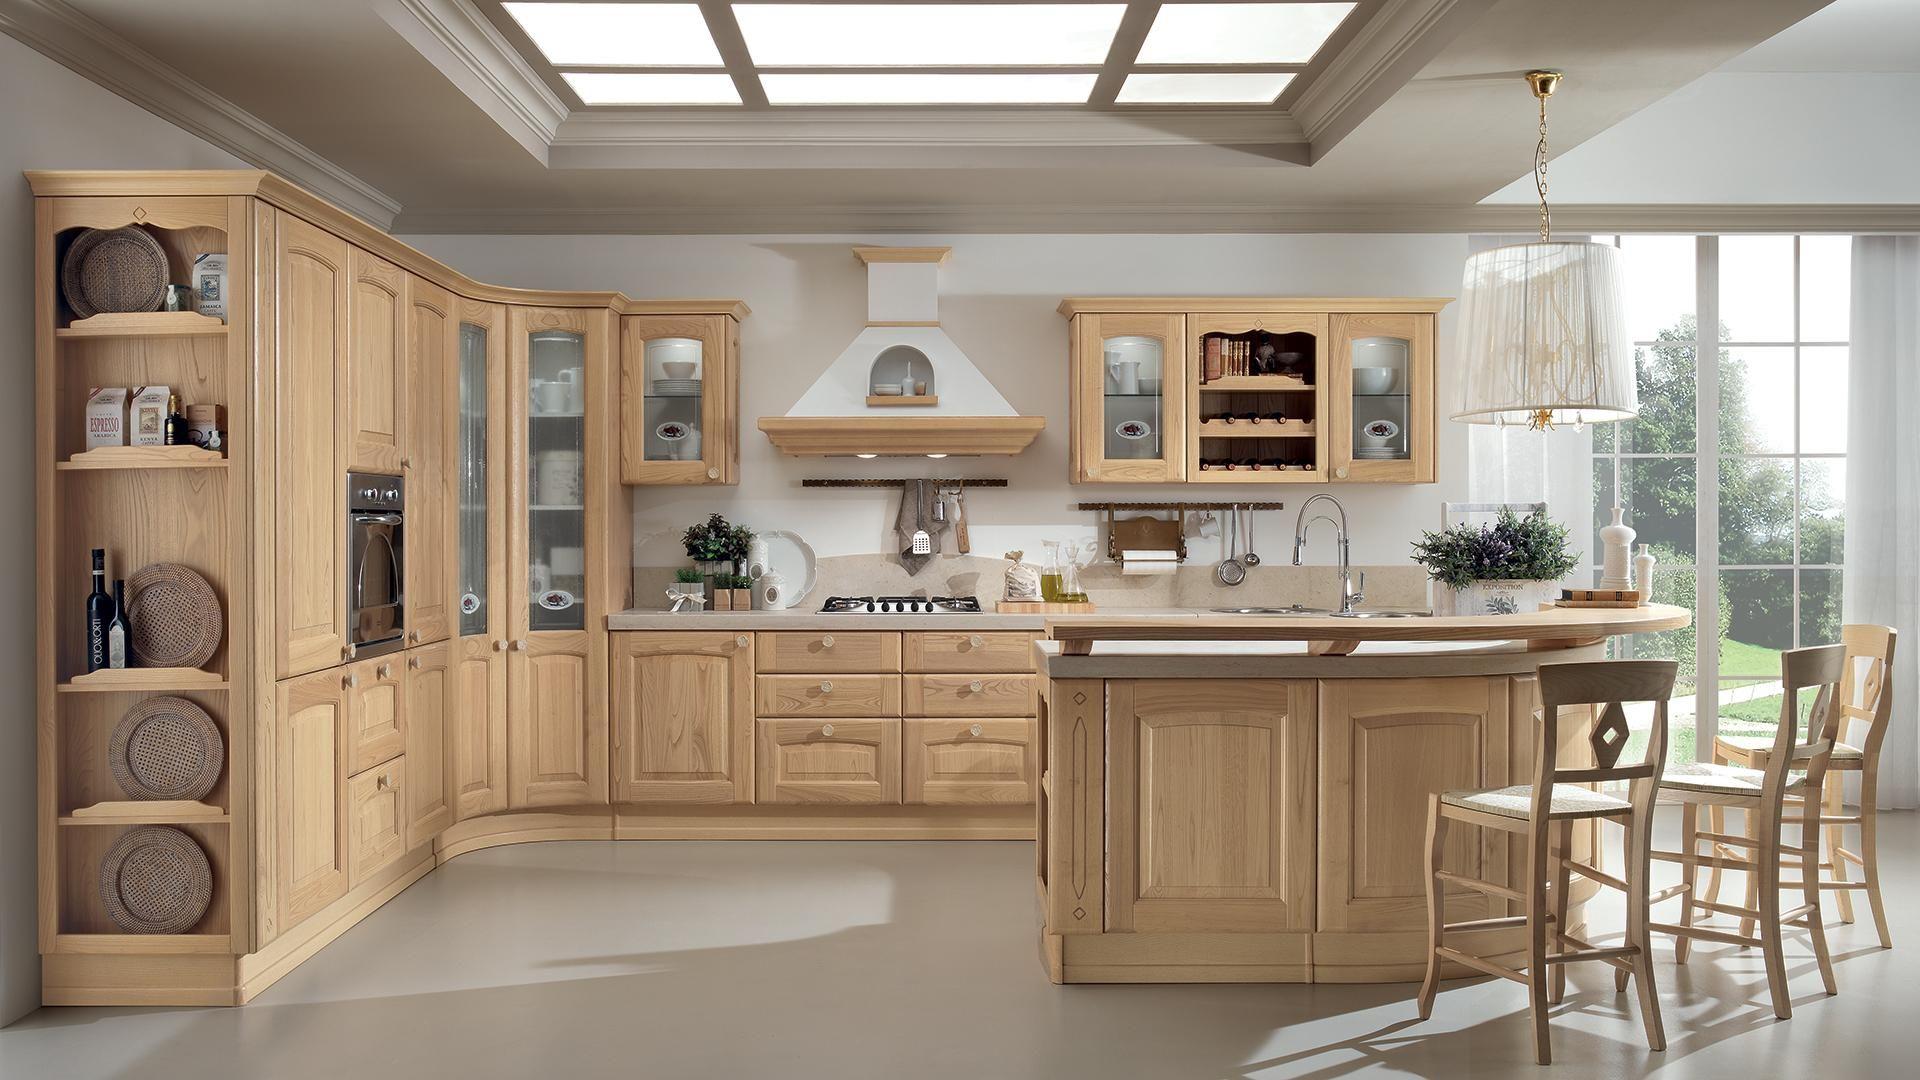 Veronica - Cucine Classiche - Cucine Lube | cucina lube Veronica ...